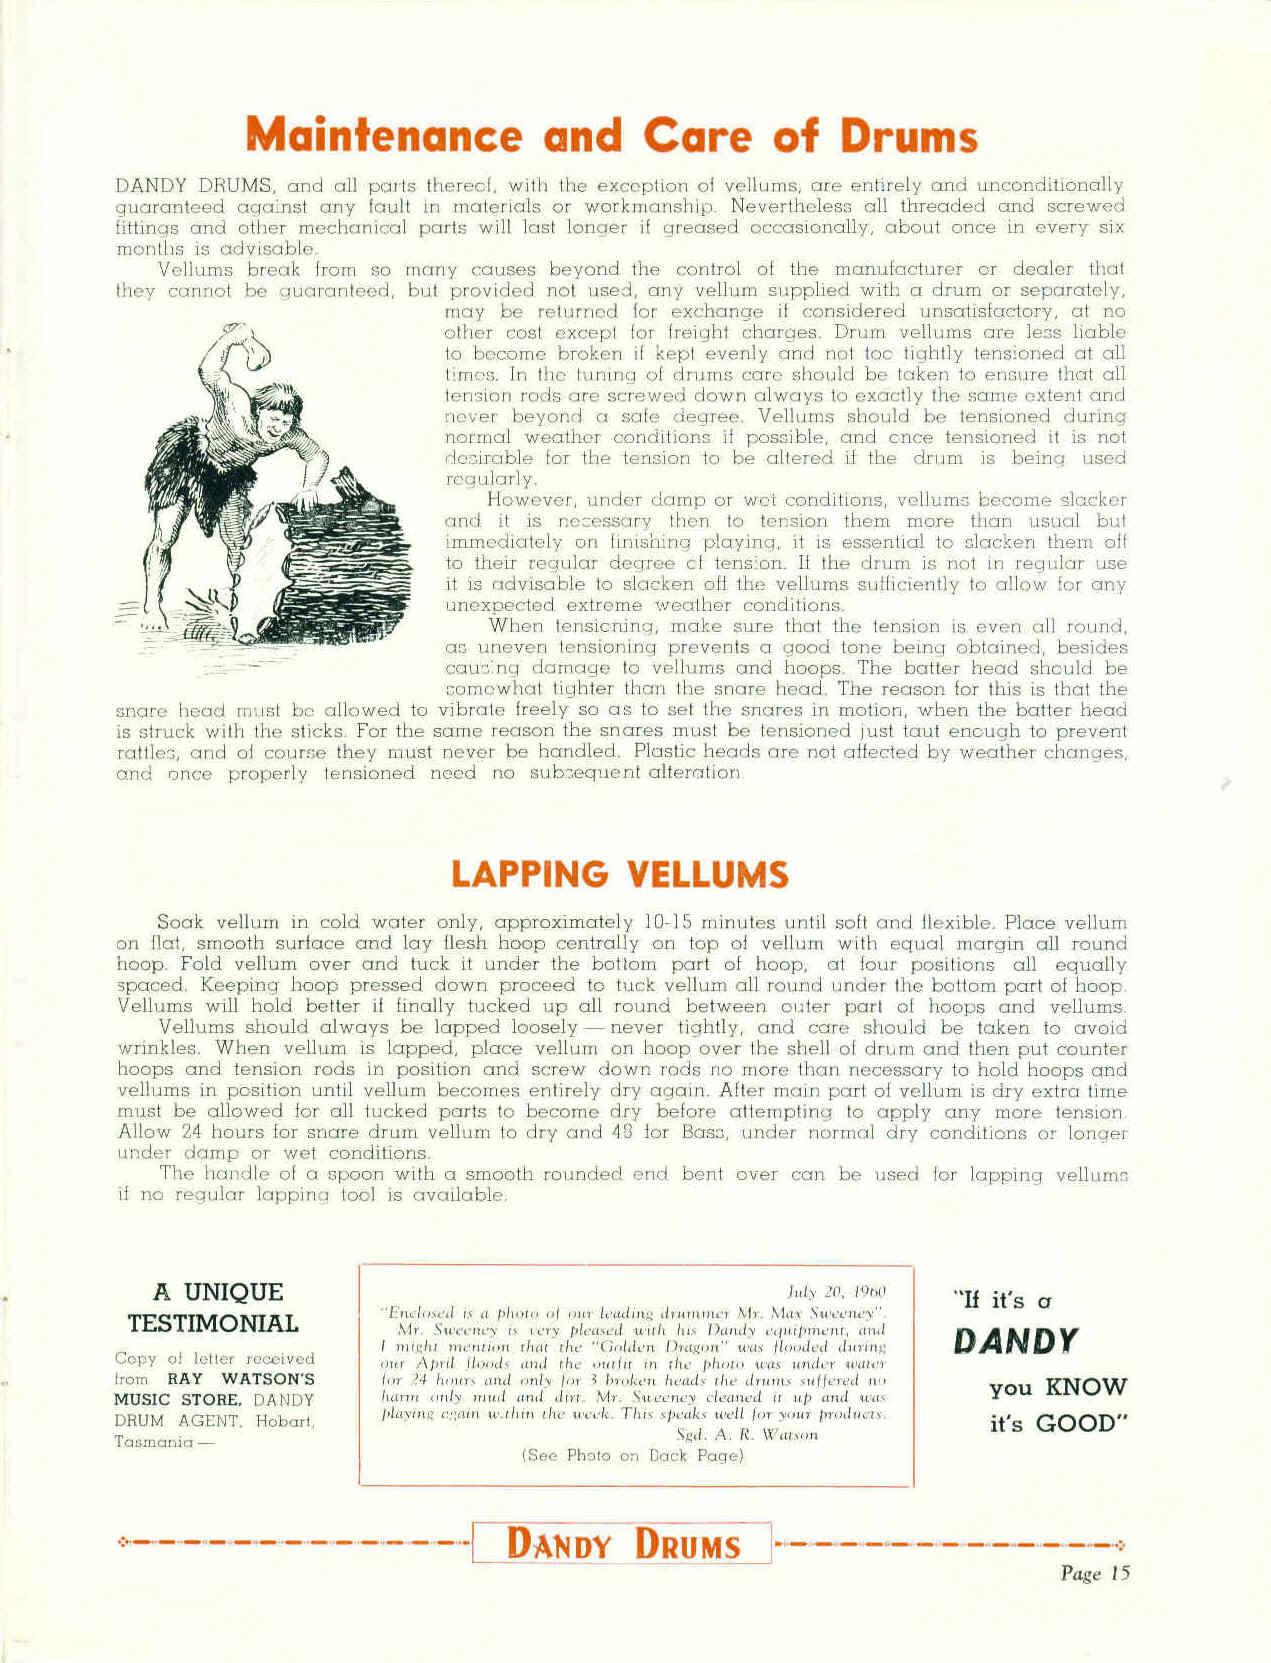 Dandy Catalogue - 16